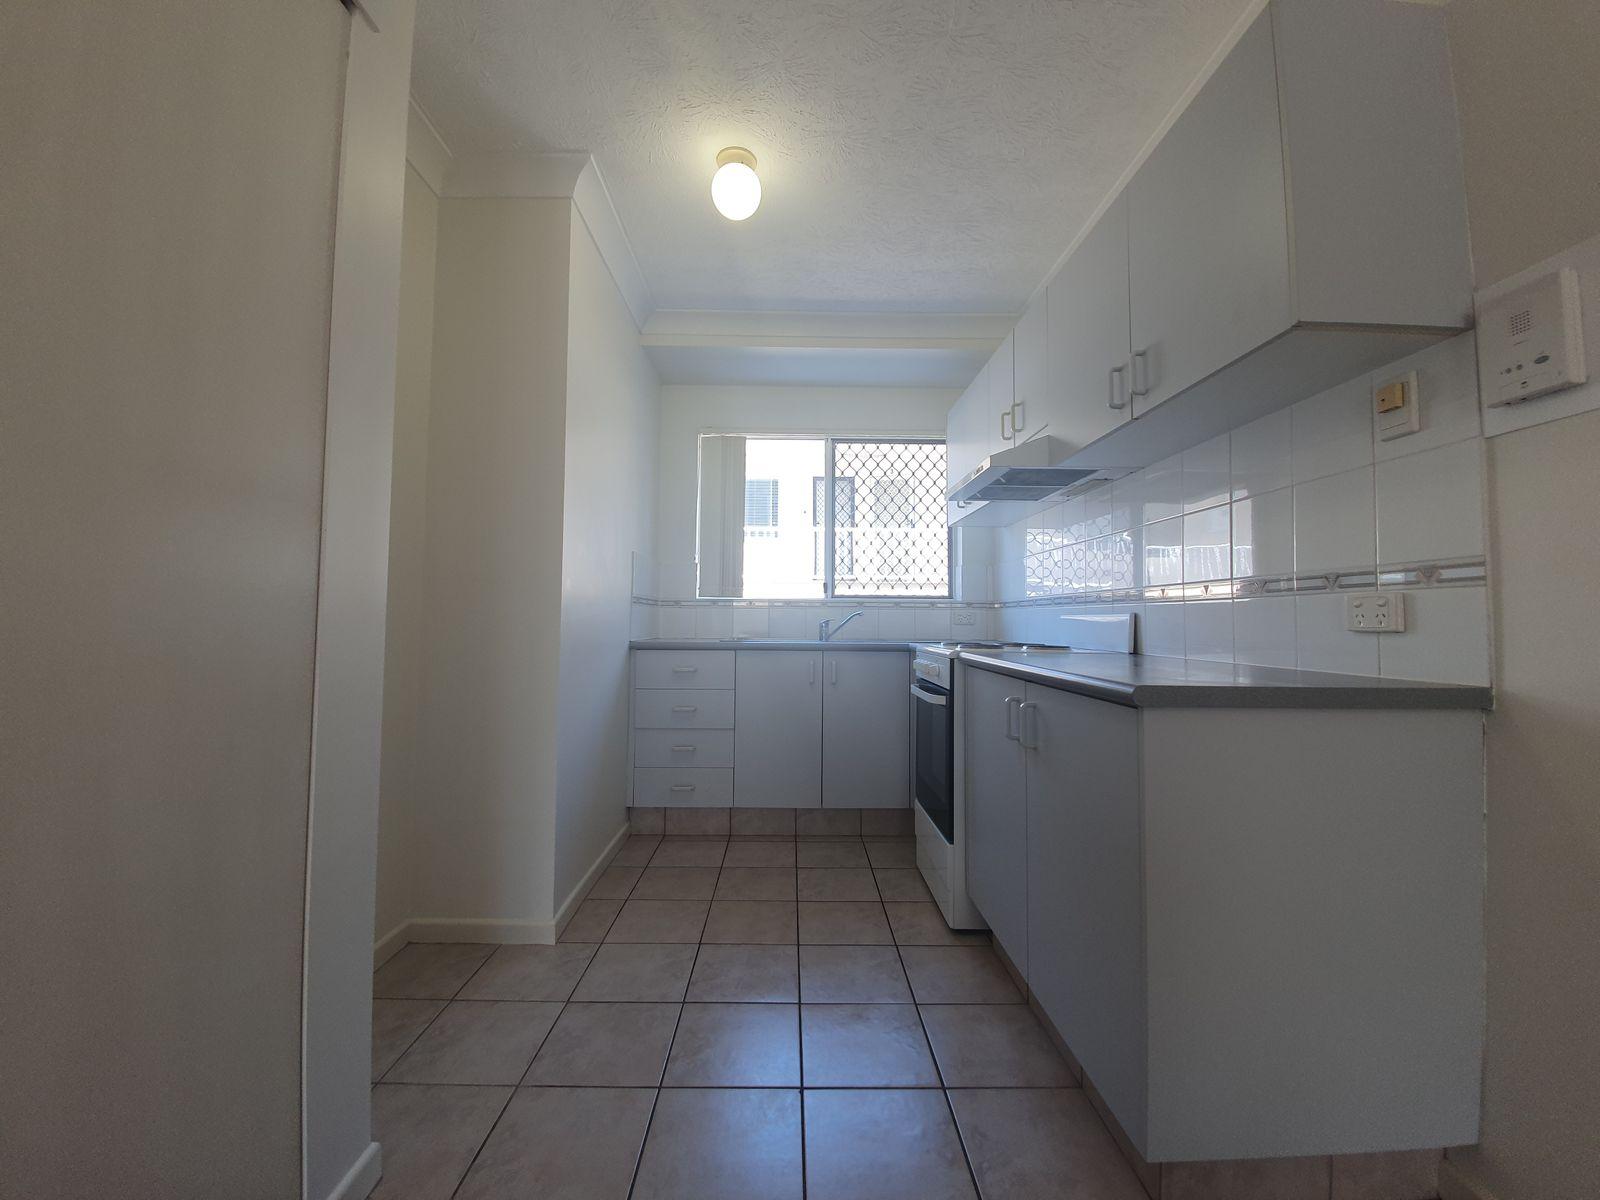 5/25 Darrambal Street, Chevron Island, QLD 4217